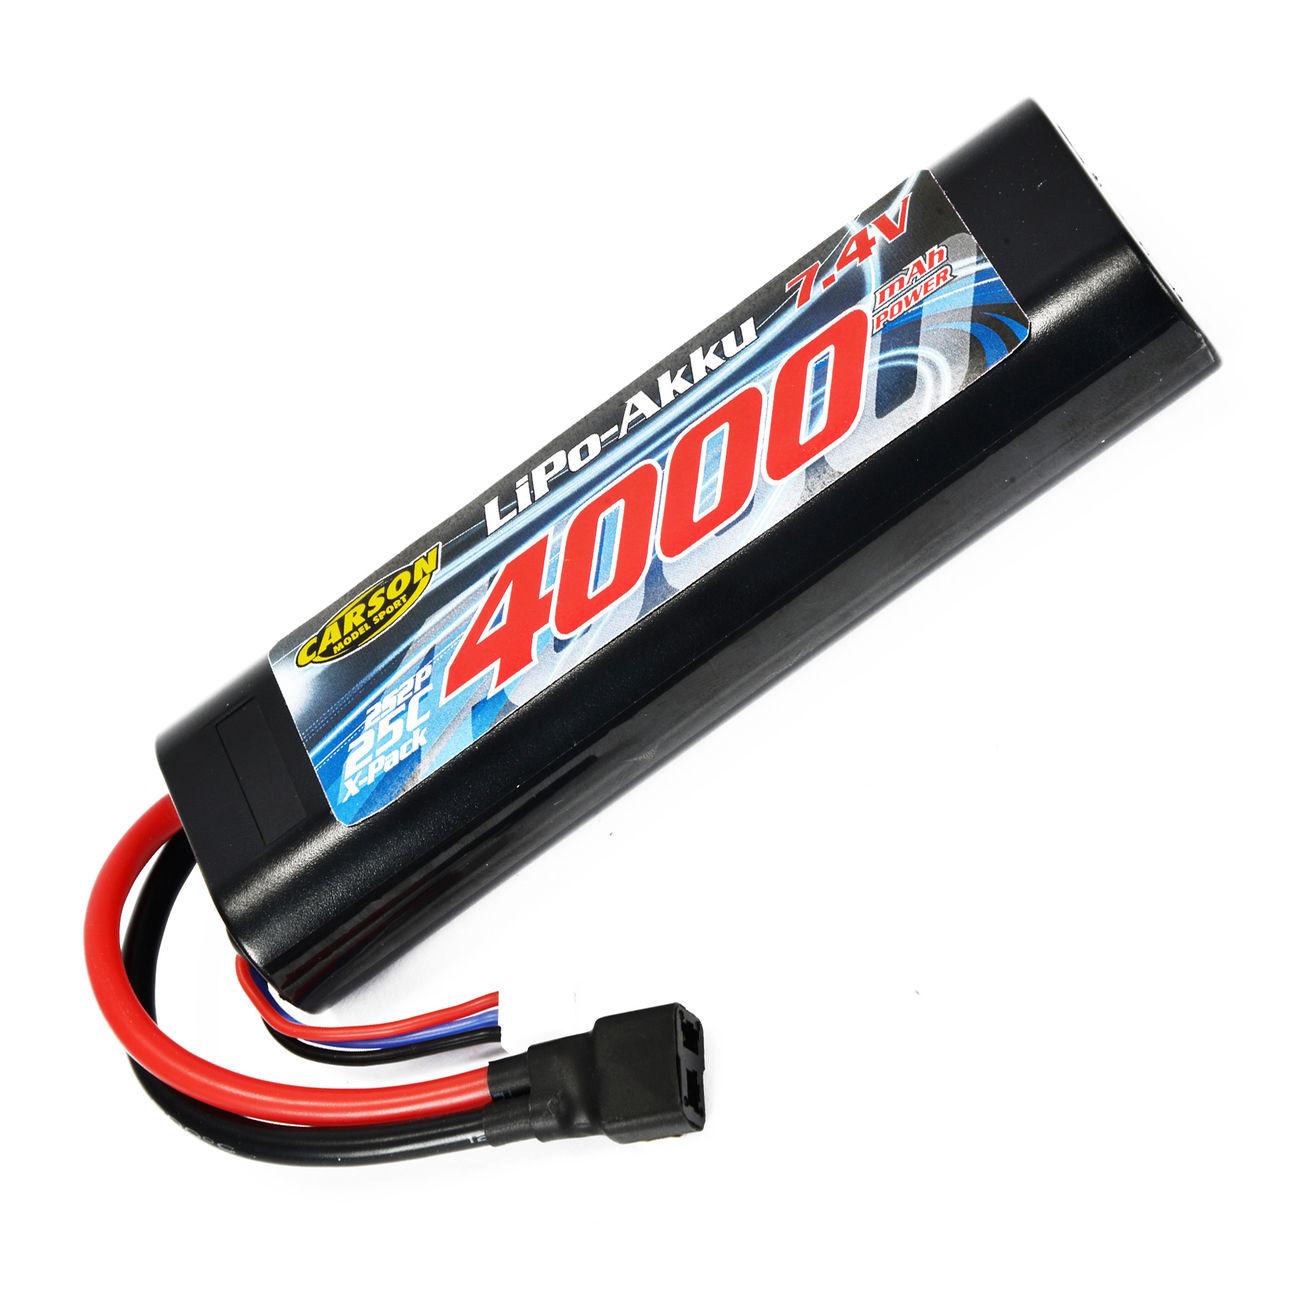 Carson lipo akku 7 4v 4000mah 25c racing pack t stecker for Lipo schreibtisch